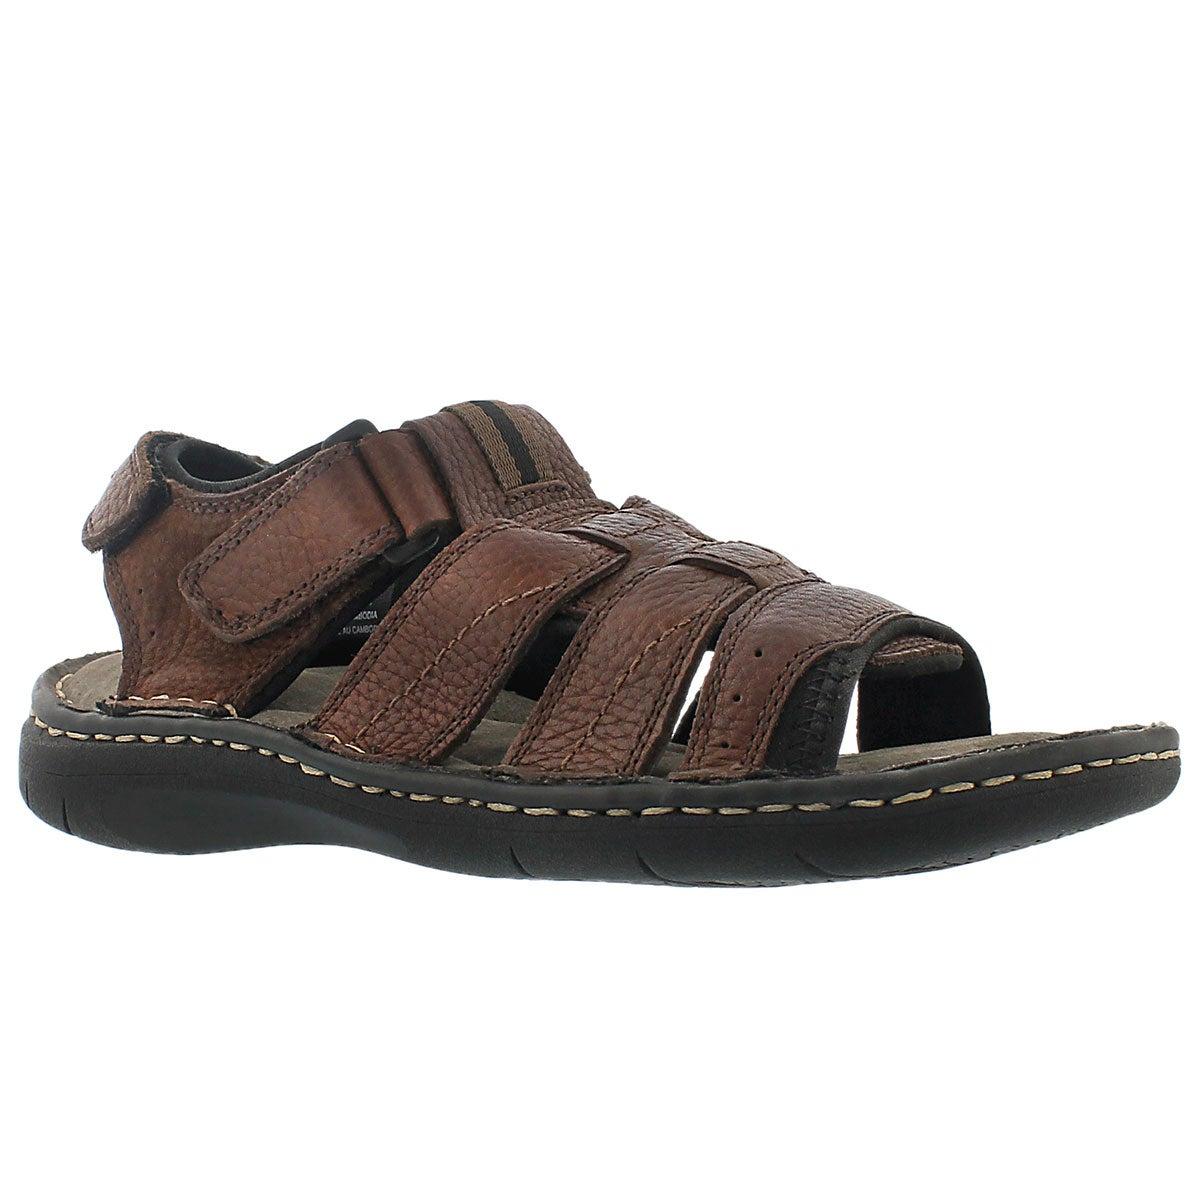 Men's COLIN 3 brown open toe fishermn sandals